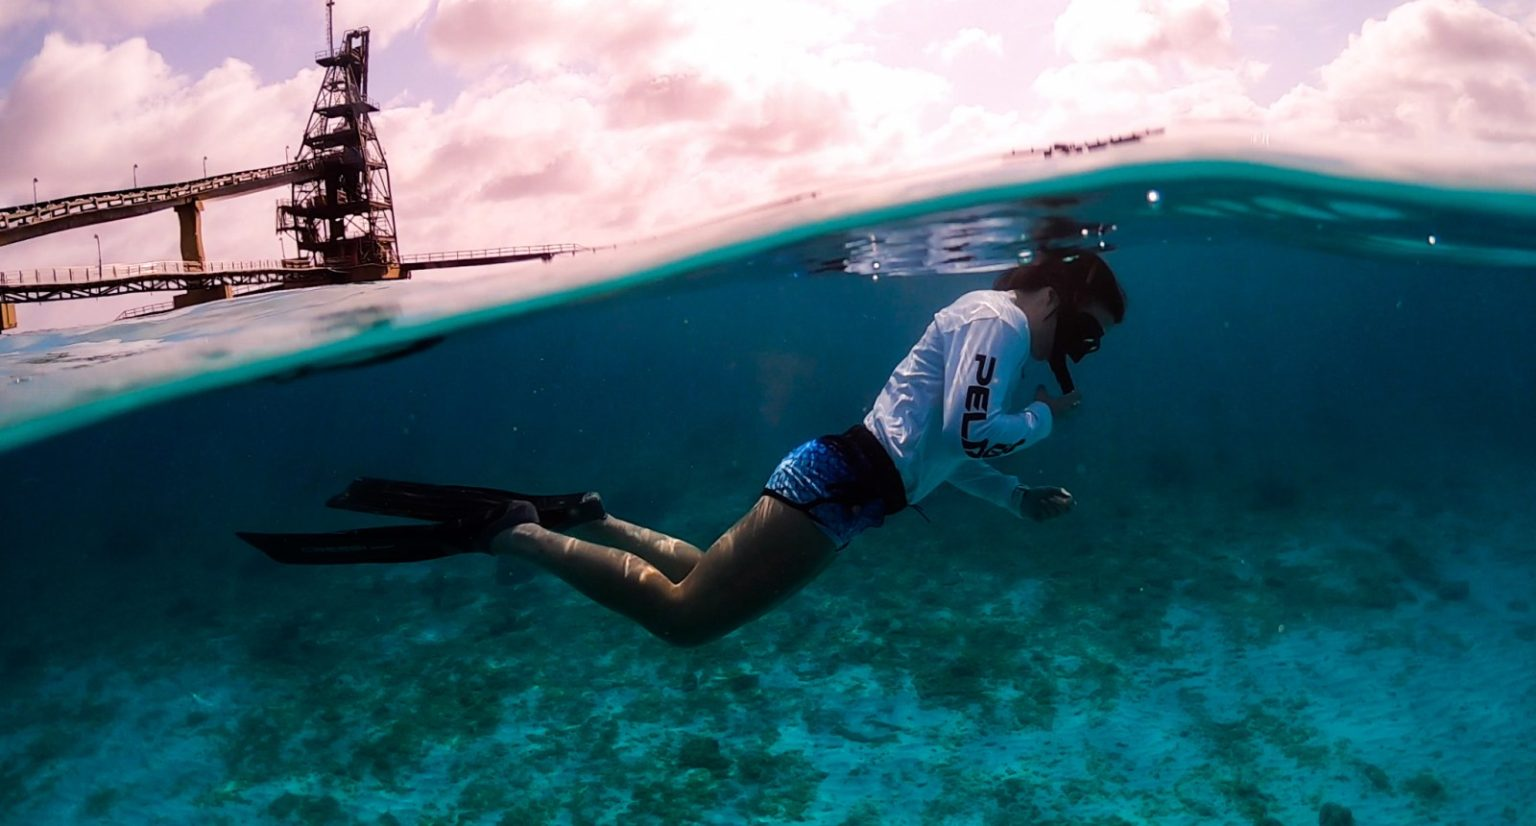 Menyelam snorkeling di Bonaire. (Dok. www.seasidewithemily.com)